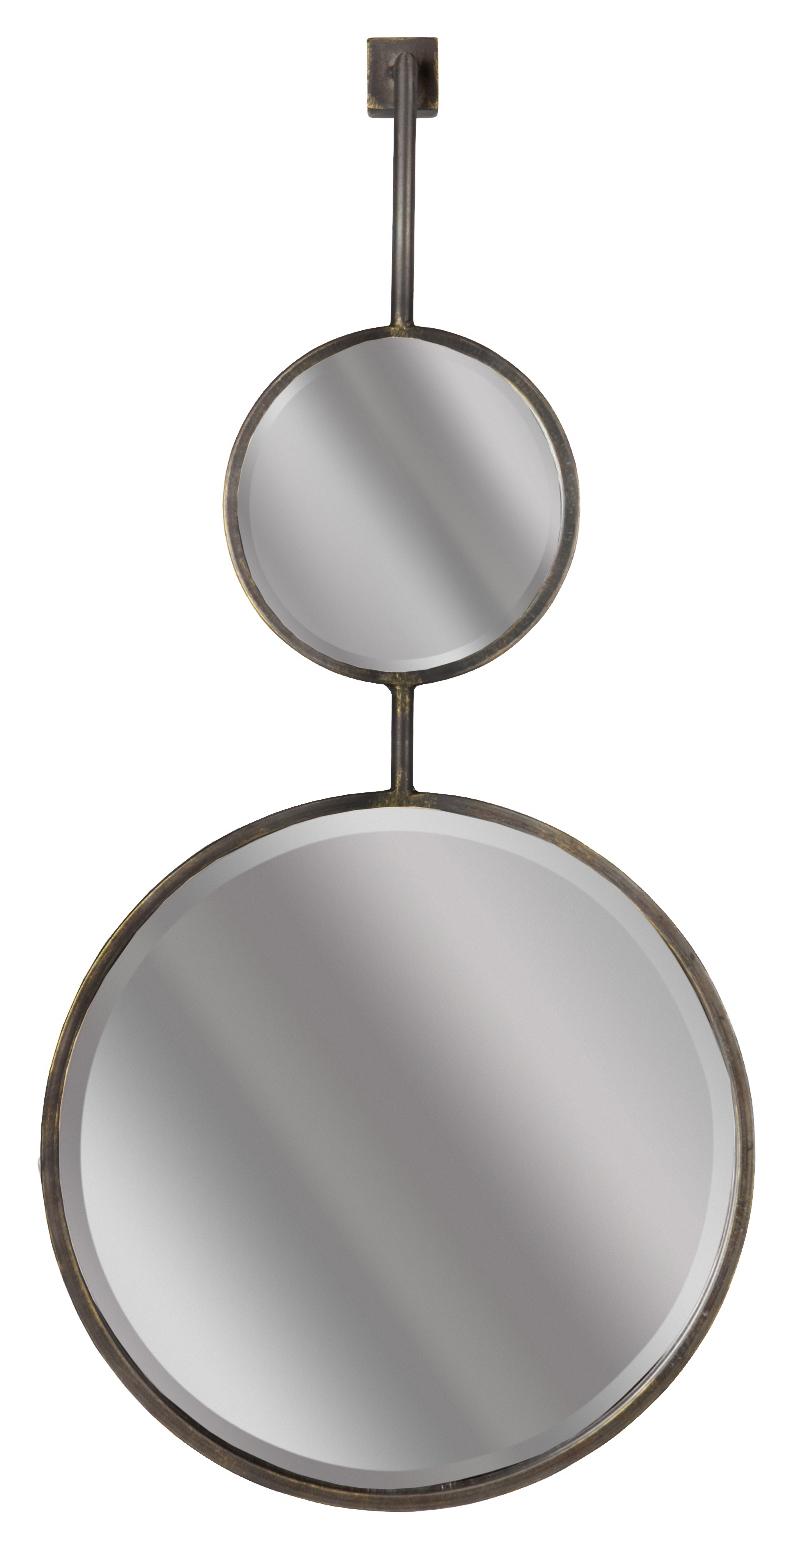 BePureHome Spiegel 'Chain' 82 x 40cm, kleur Antique Black Woonaccessoires | Spiegels kopen